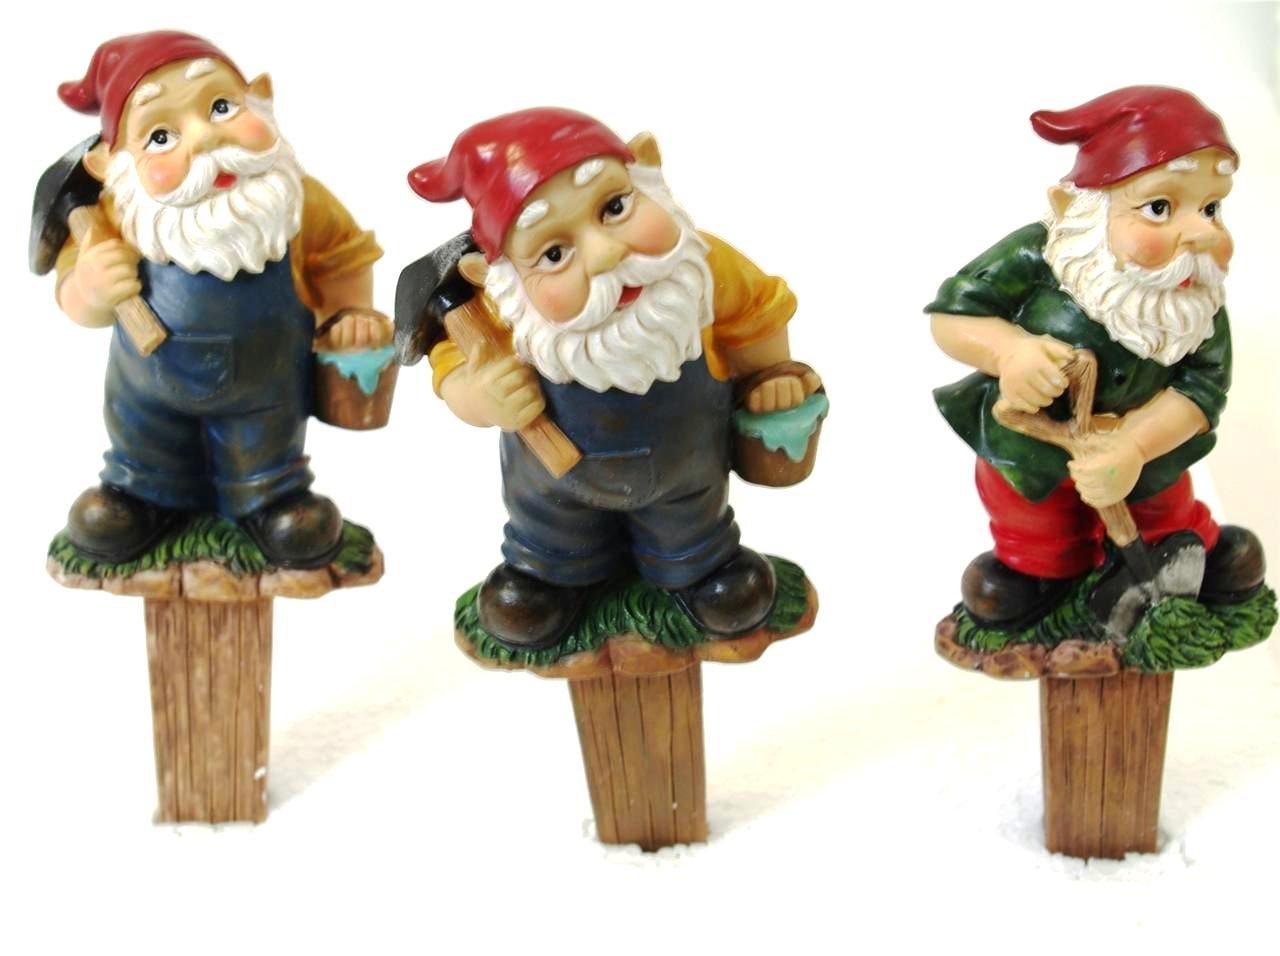 Set of 3 Large Garden Gnome Plant Pot Sticks Plant Pot Character Gnomes Ornament Sherwood